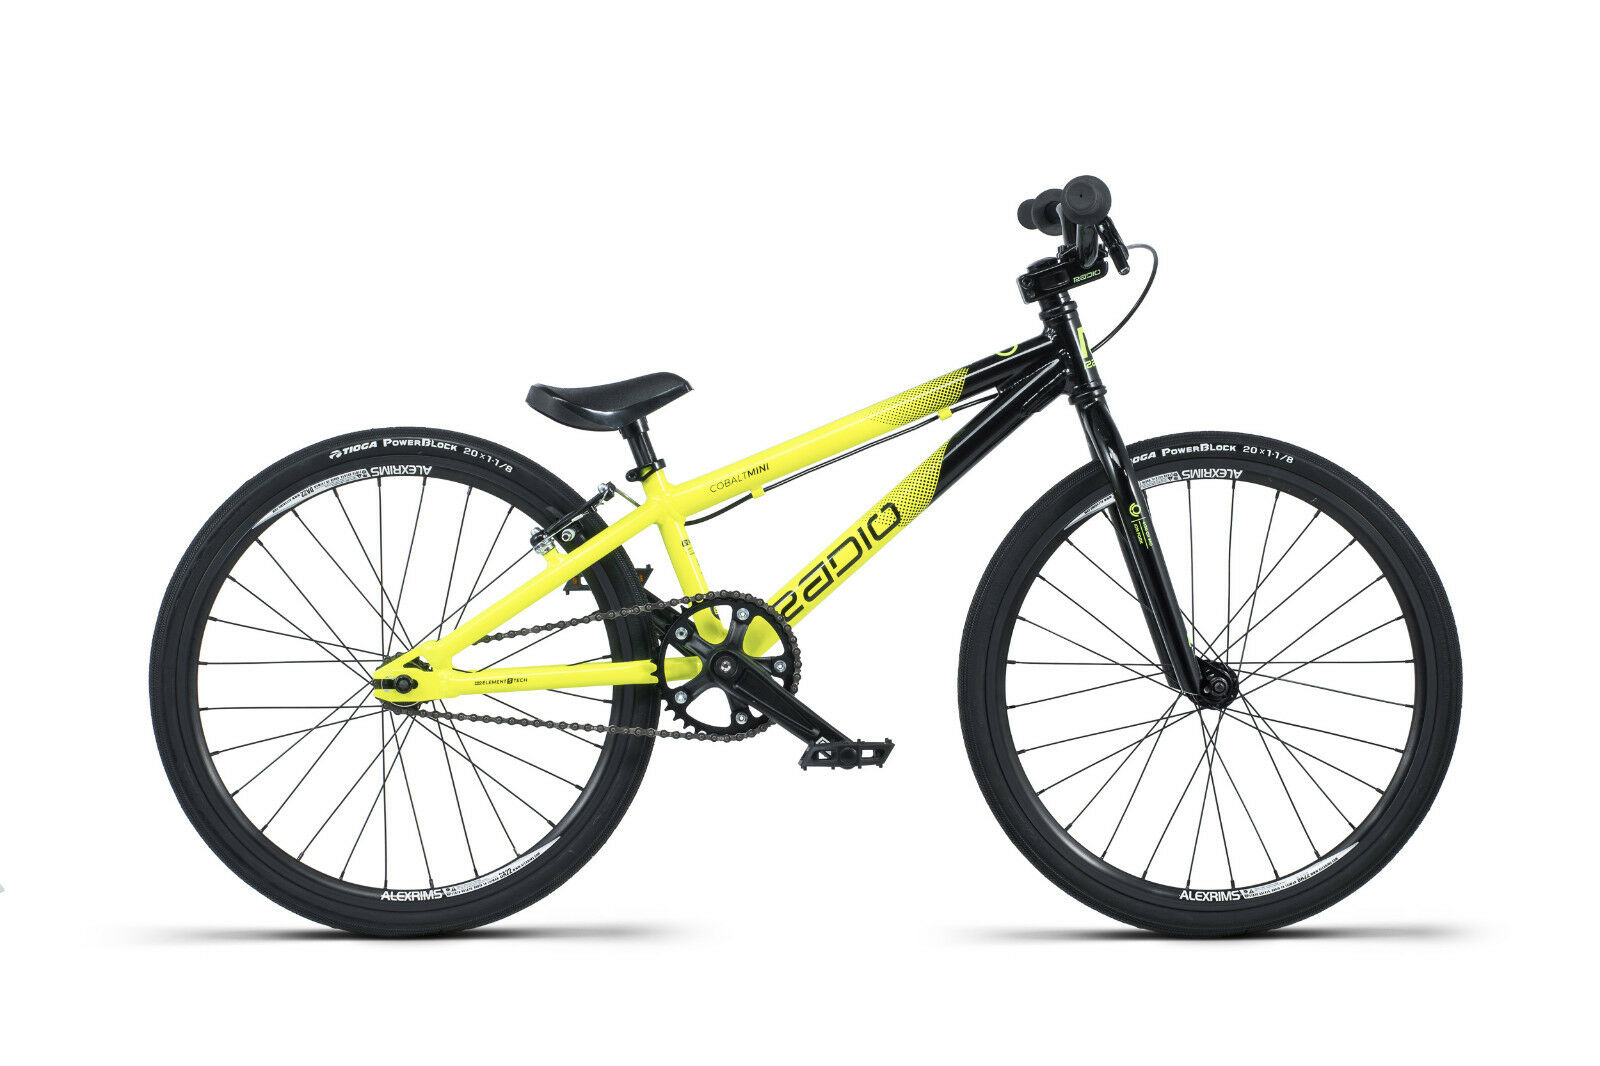 2019 Radio Raceline Kobalt Mini 17.5 black yellow Komplett BMX Rennrad 17.5